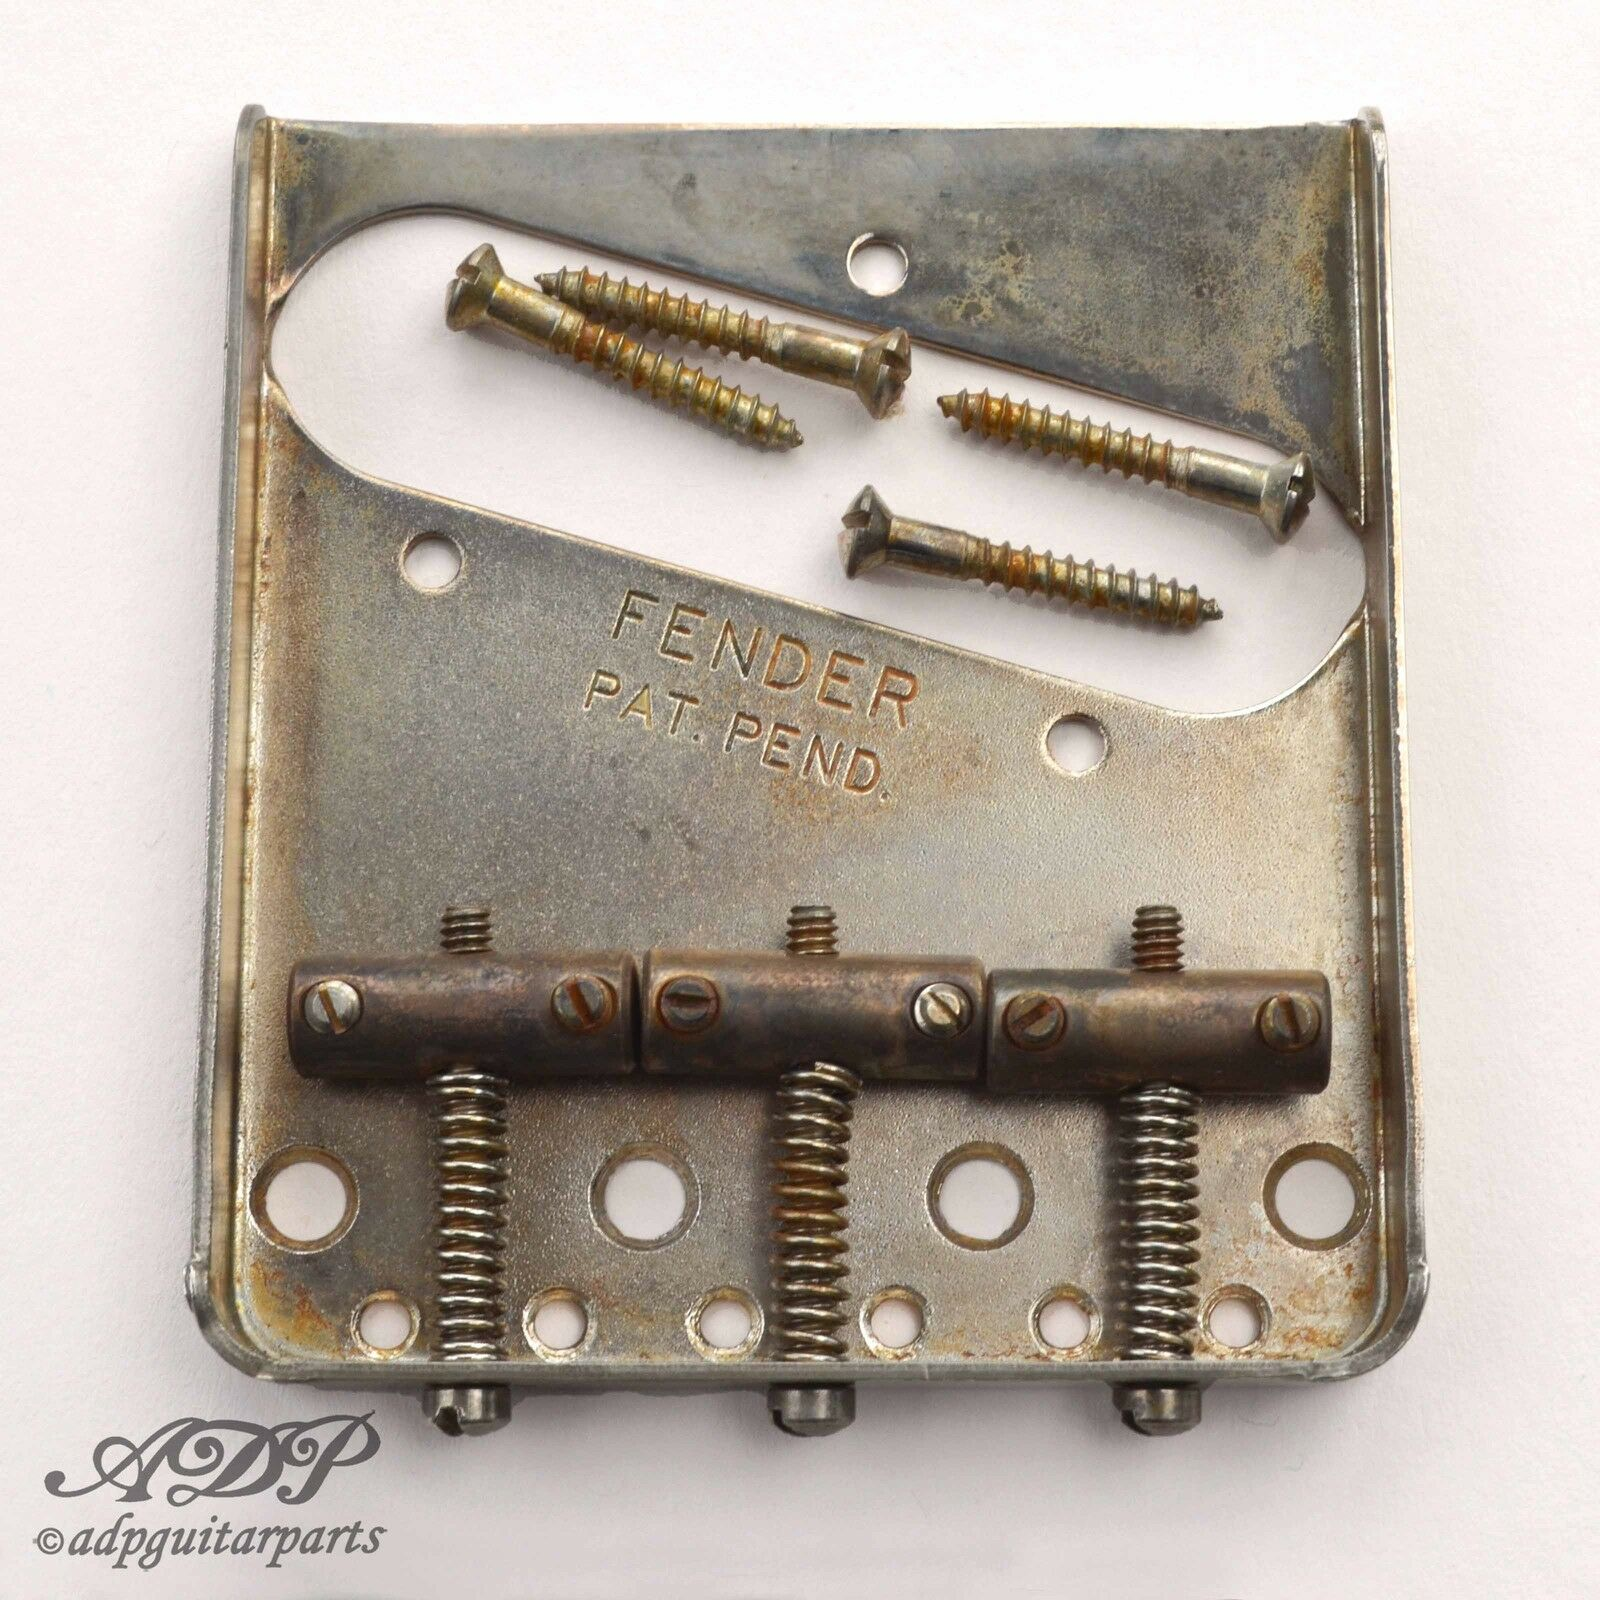 CordierTelecaster Fender USA Pat-Pend 3xBrass SaddleTele Bridge 0990806100 Relic